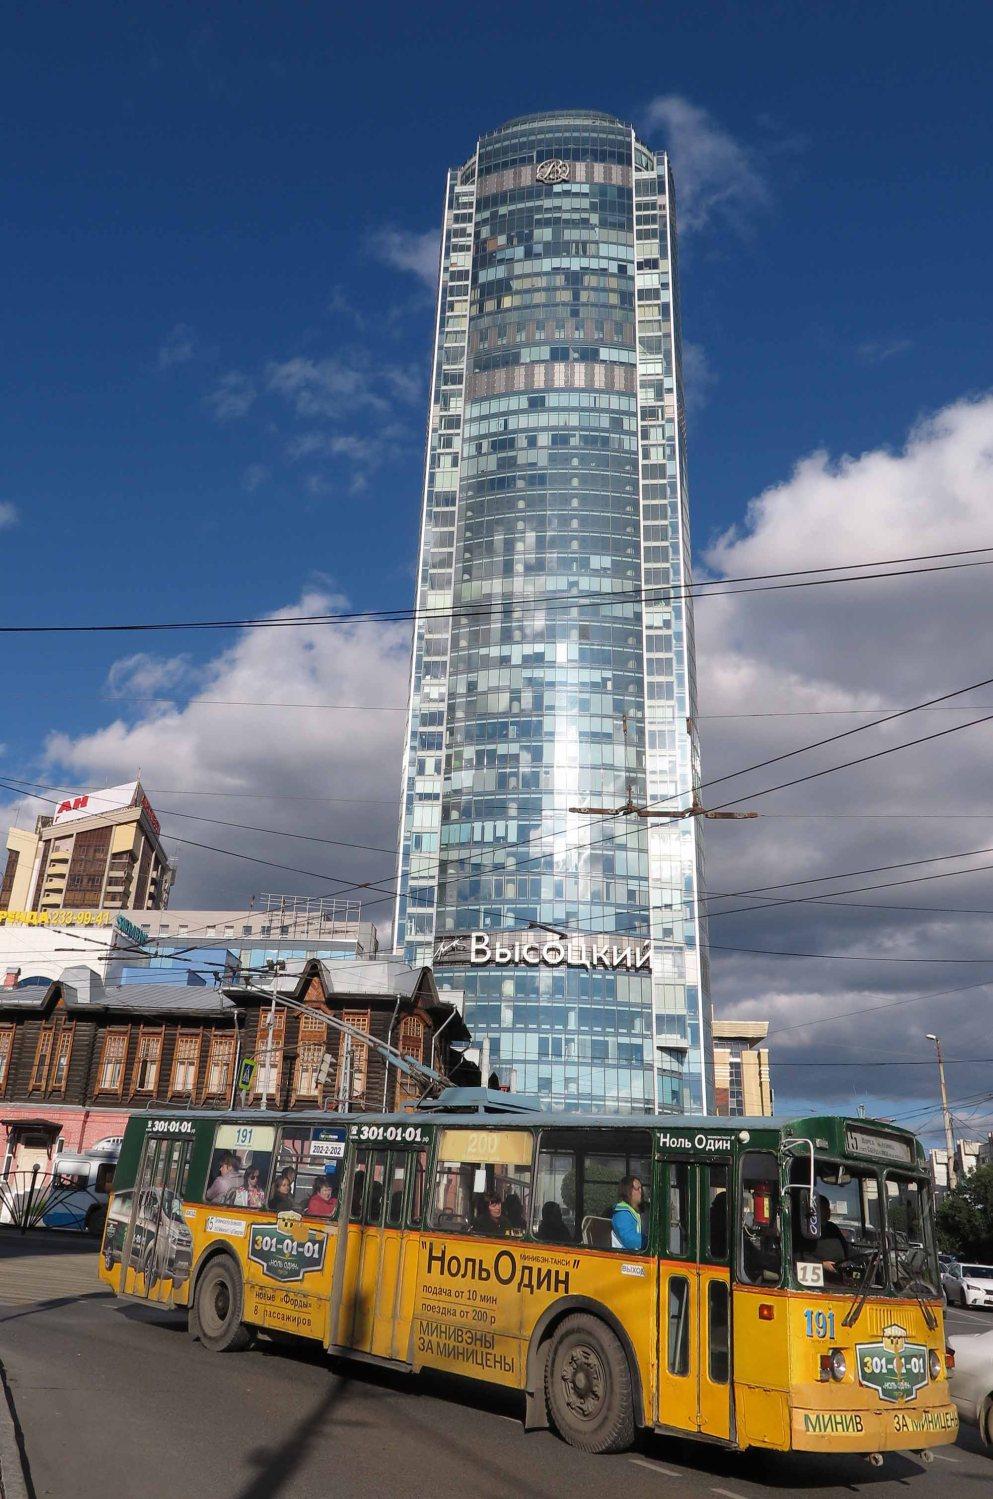 Russia-Trans-Siberian-Railway-Ekaterinburg-Skyscraper